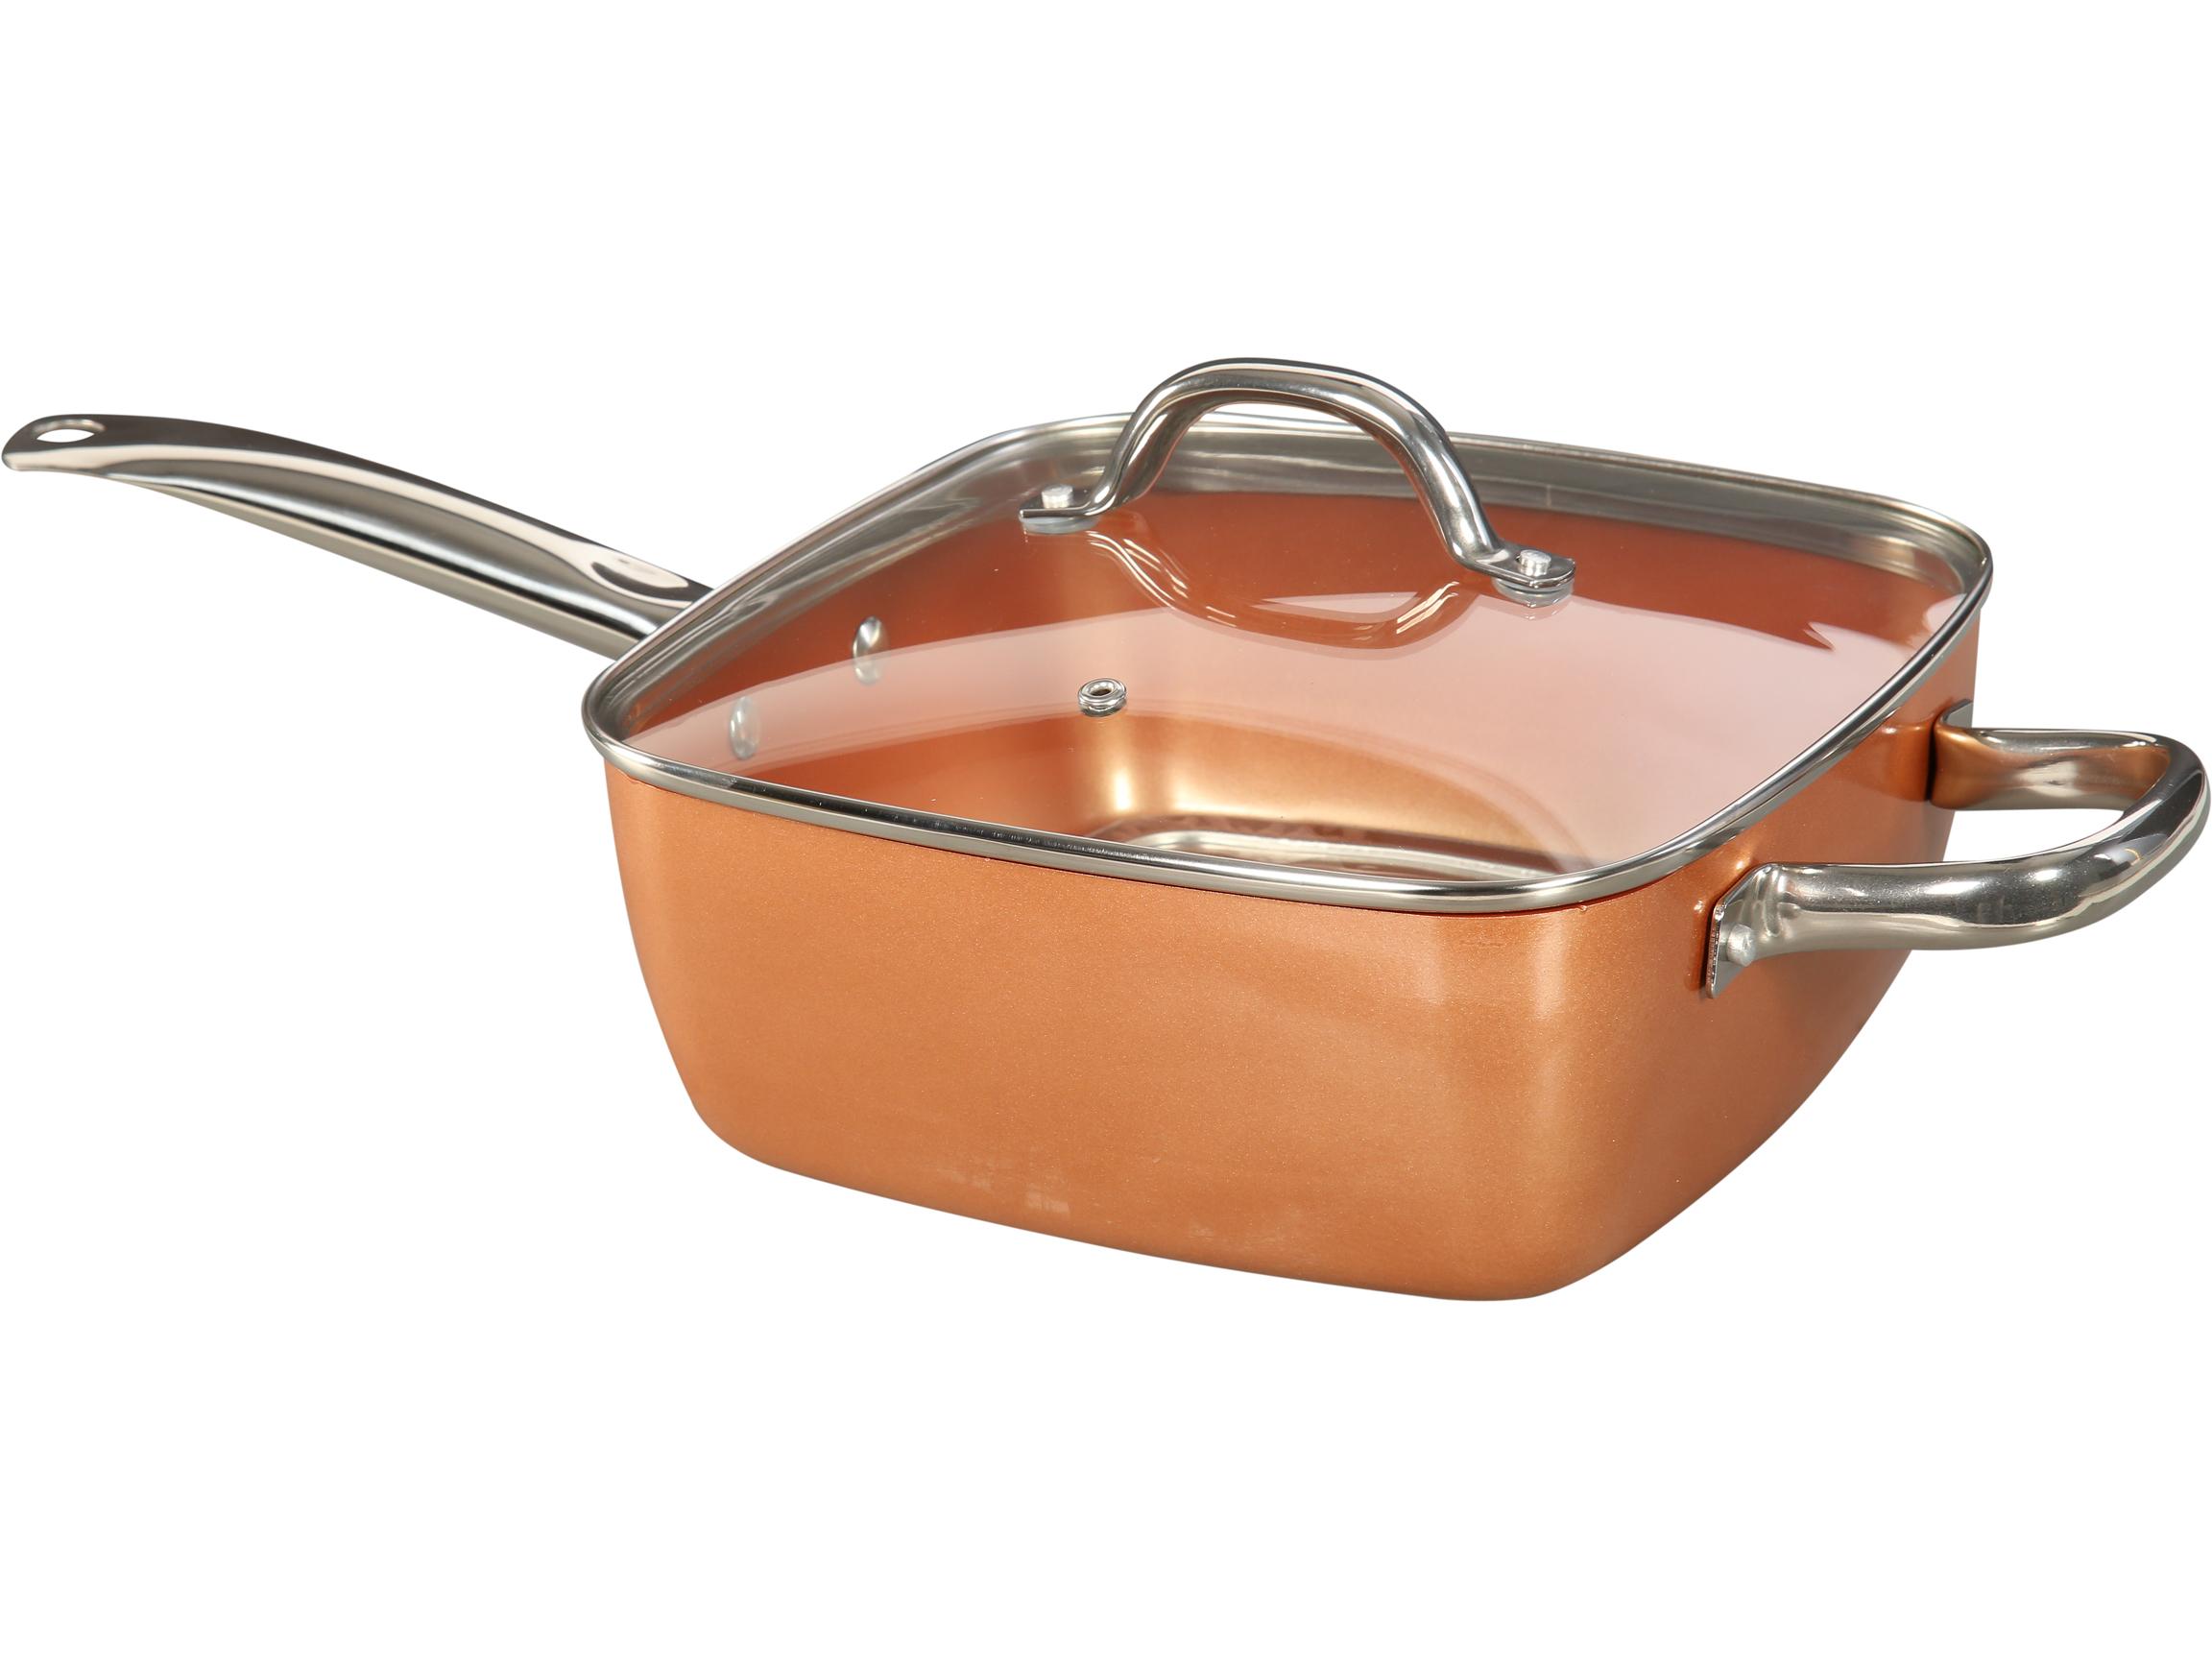 Tayama TCSP-10 Induction Square Pan, Medium, Copper